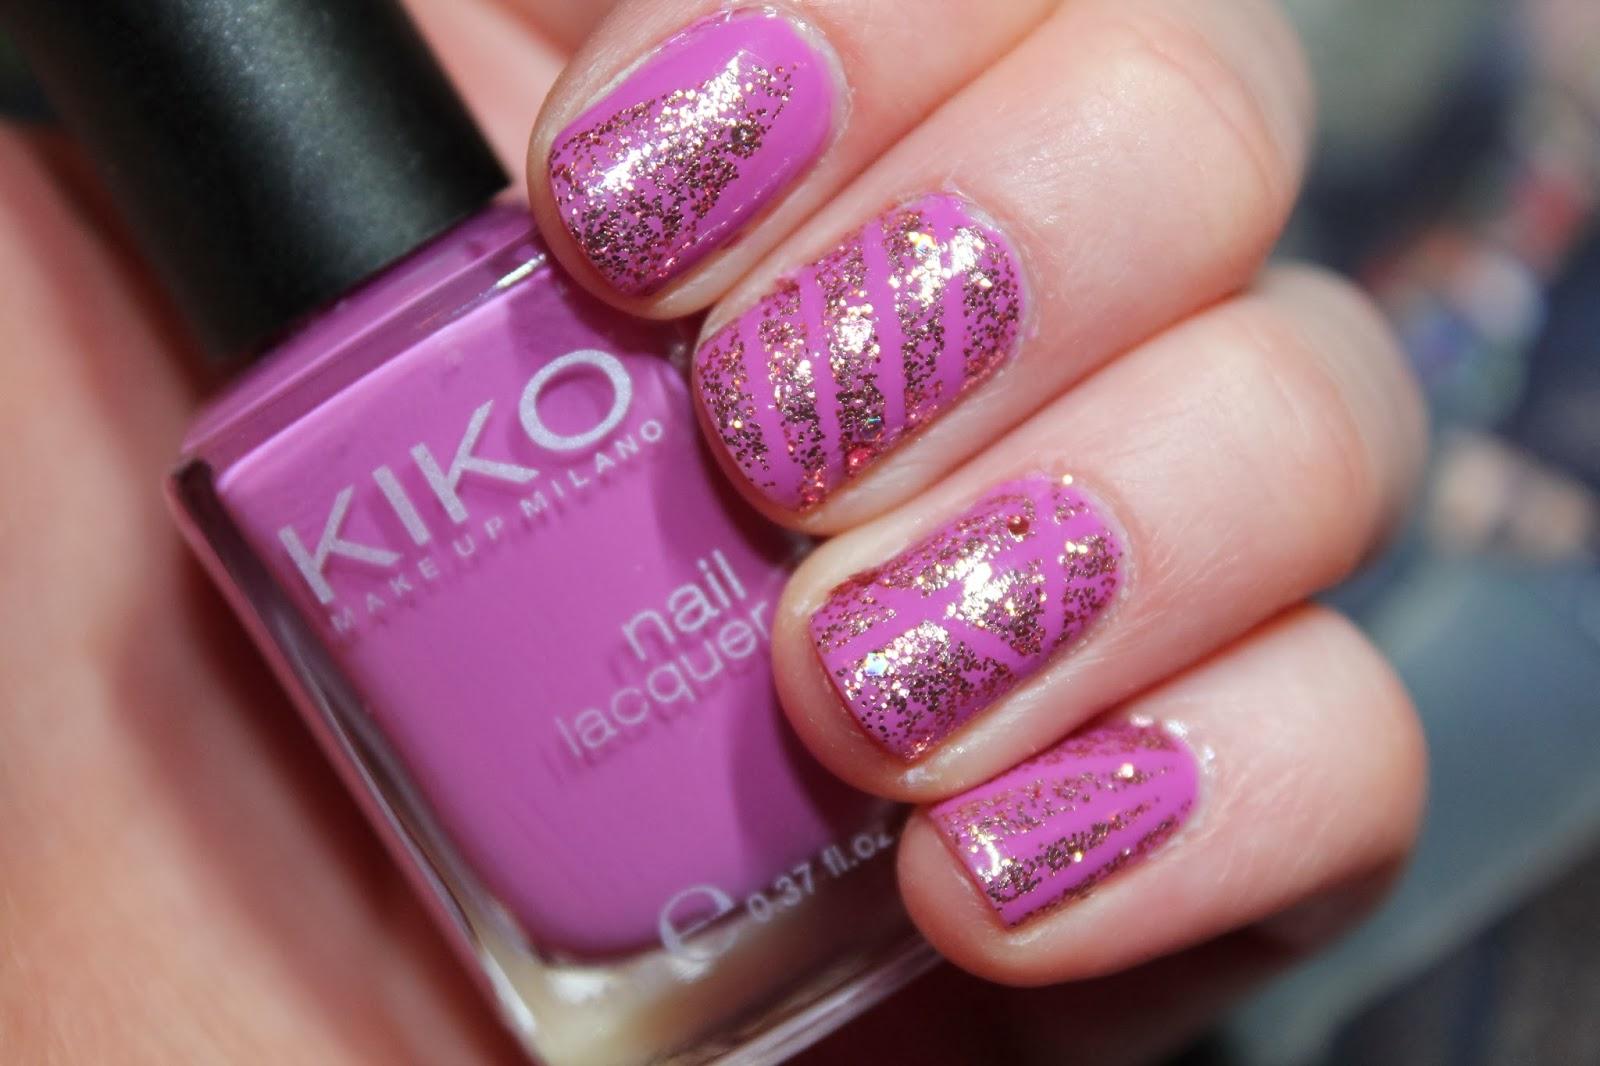 kiko-nicole-opi-nail-varnish-polish-pink-glitter-sparkle